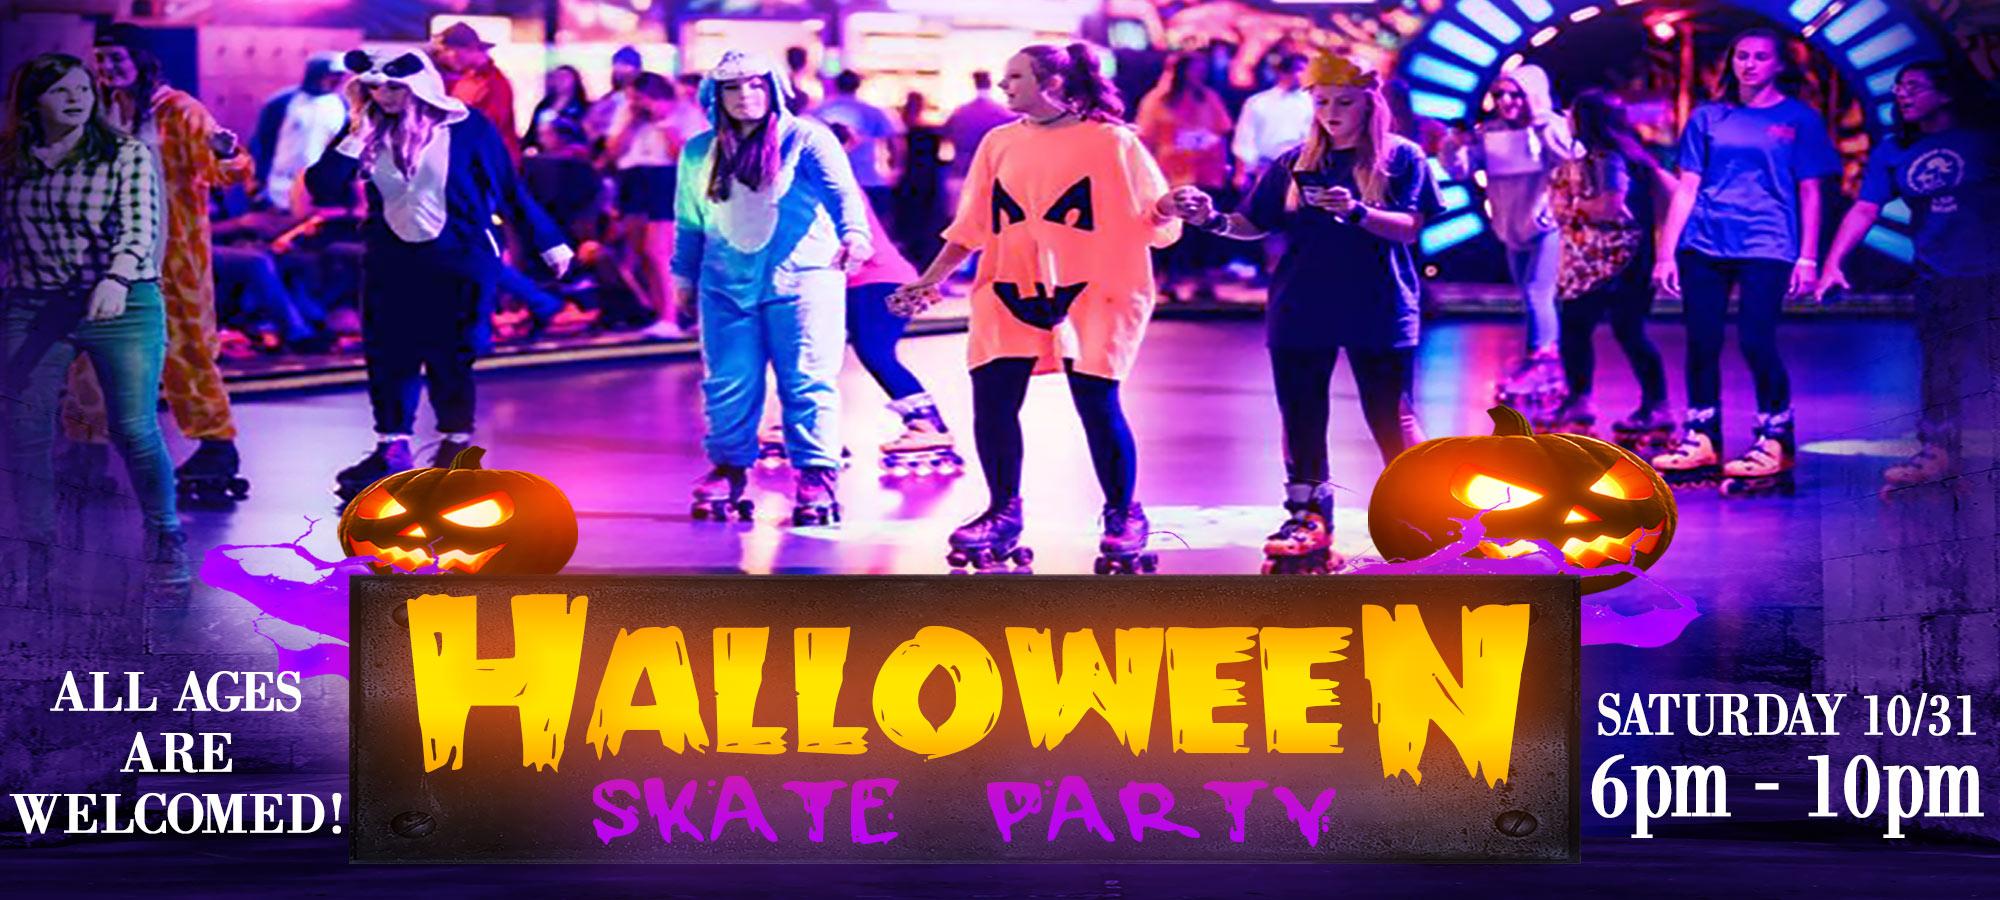 Halloween-Skate-Night-2020